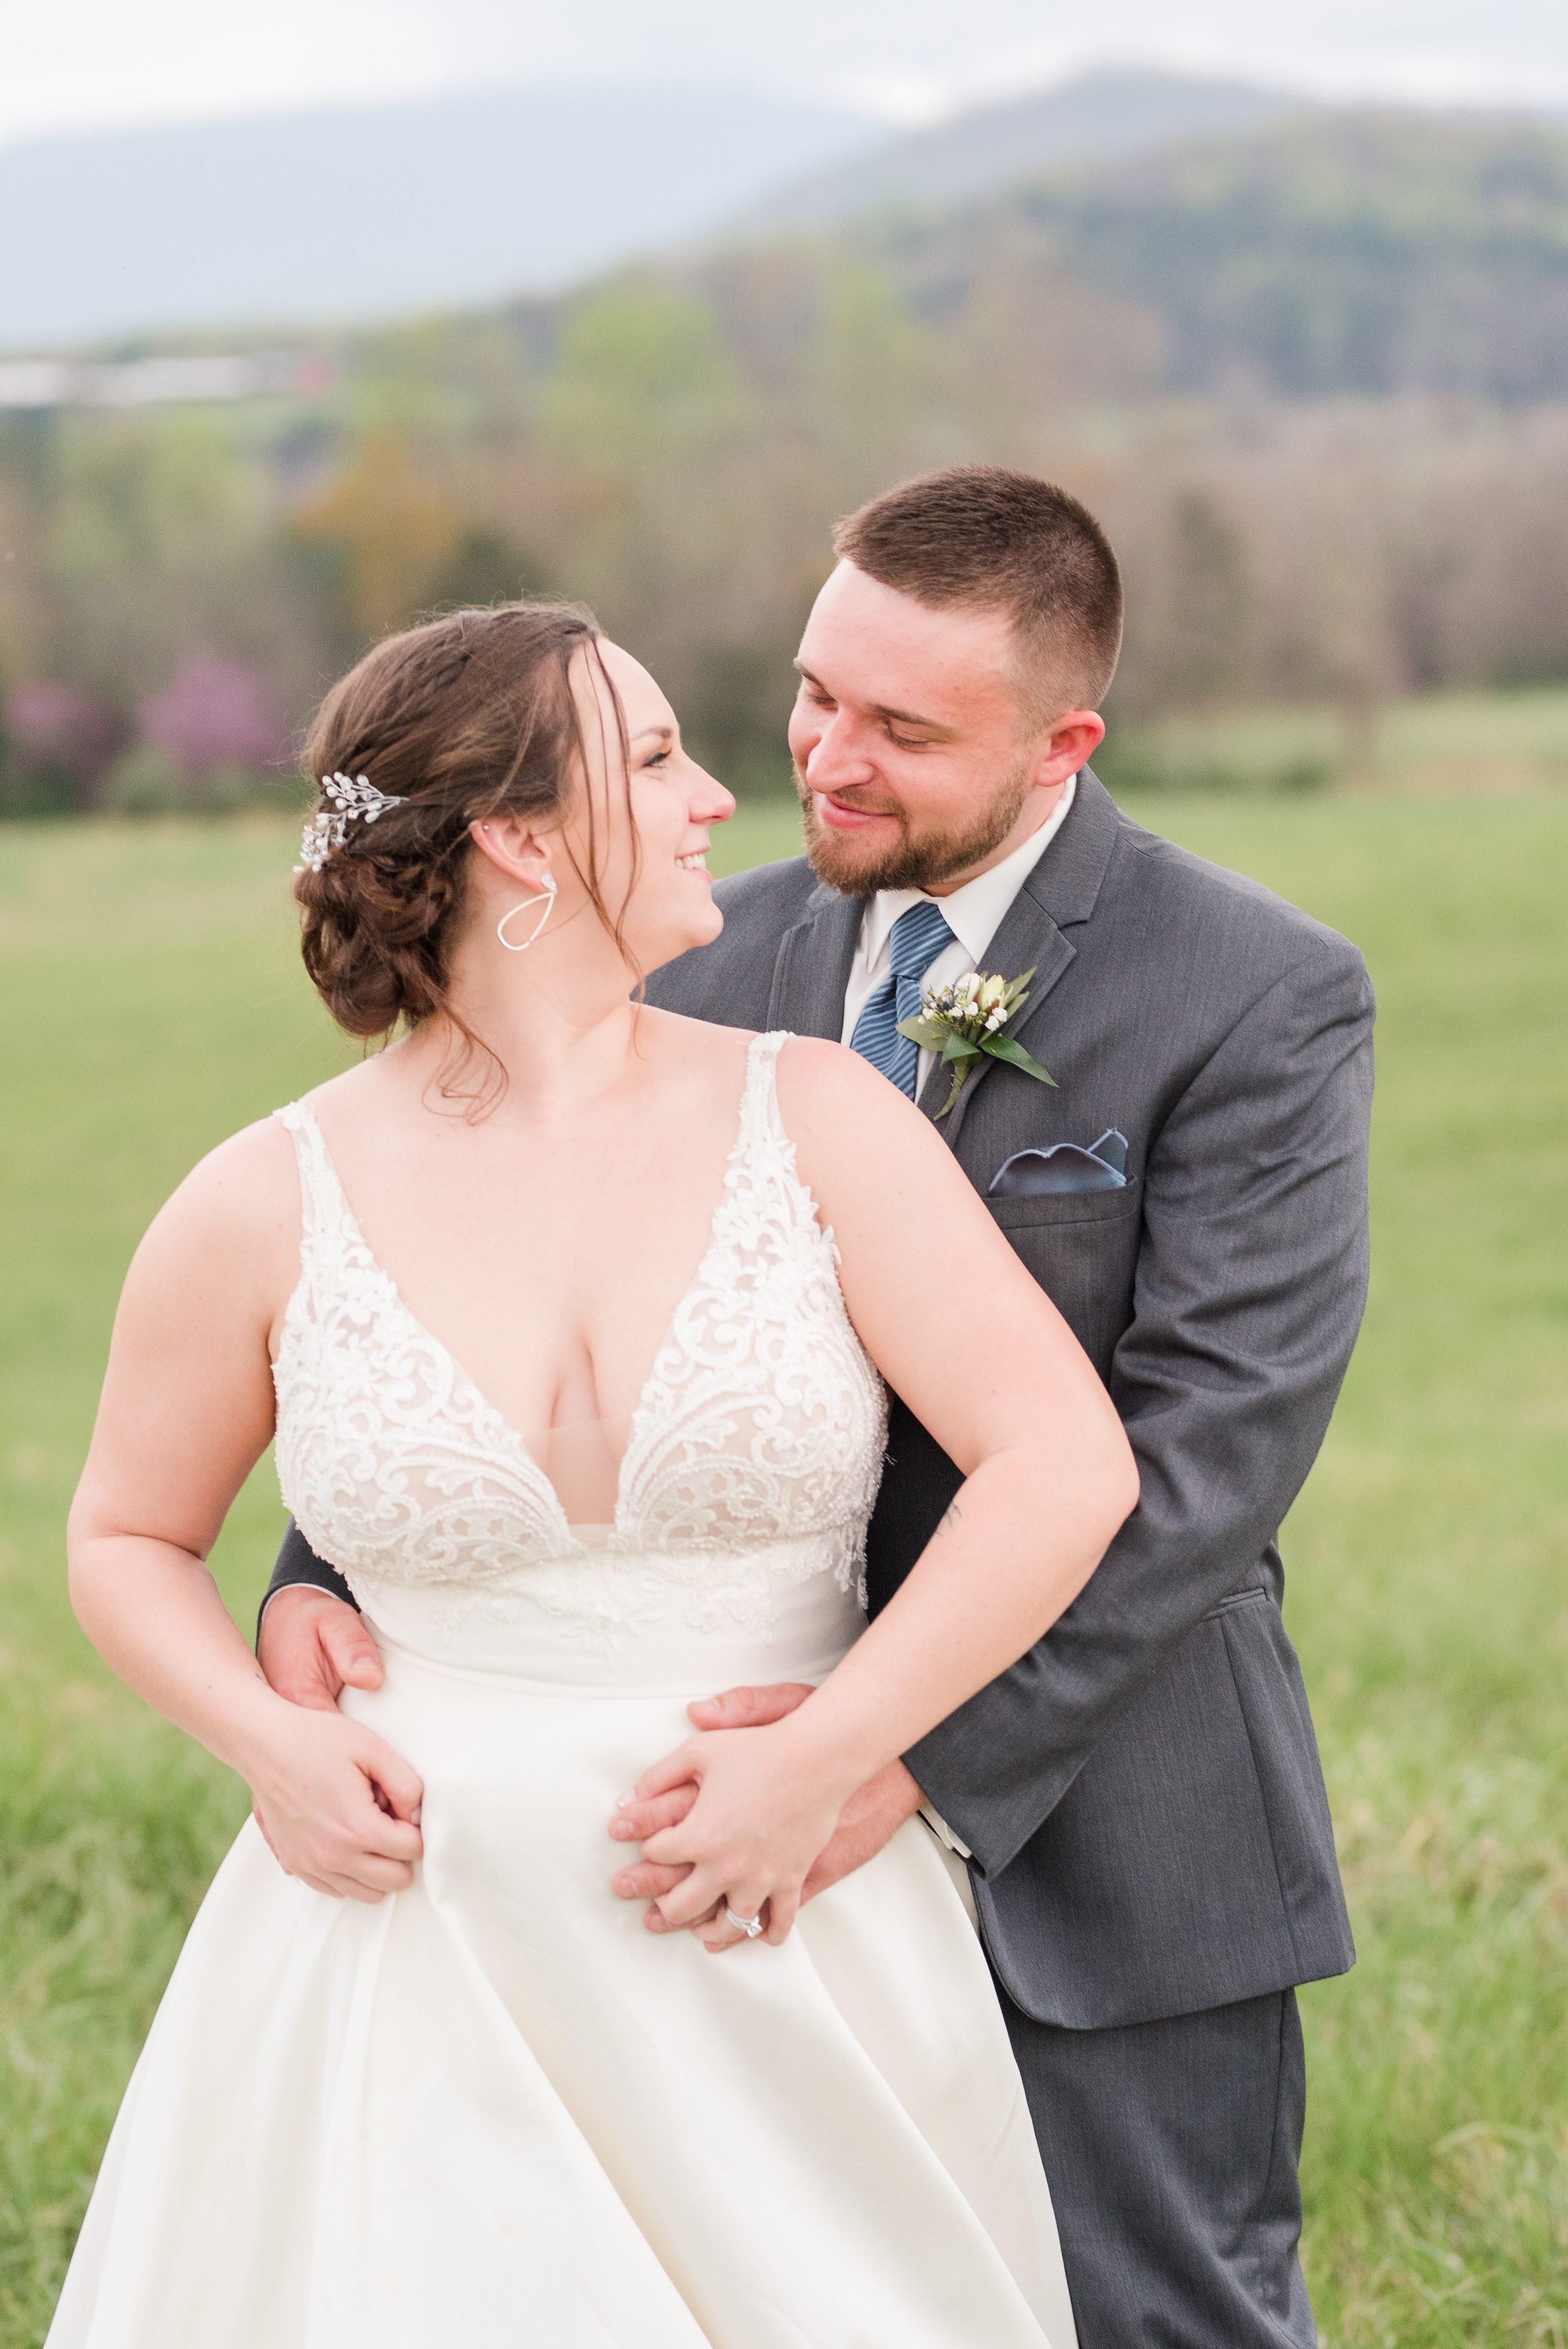 Southern Wedding,Edgewood,Blue Ridge Mountains,bride and groom,edgewood barn,Barn at Edgewood